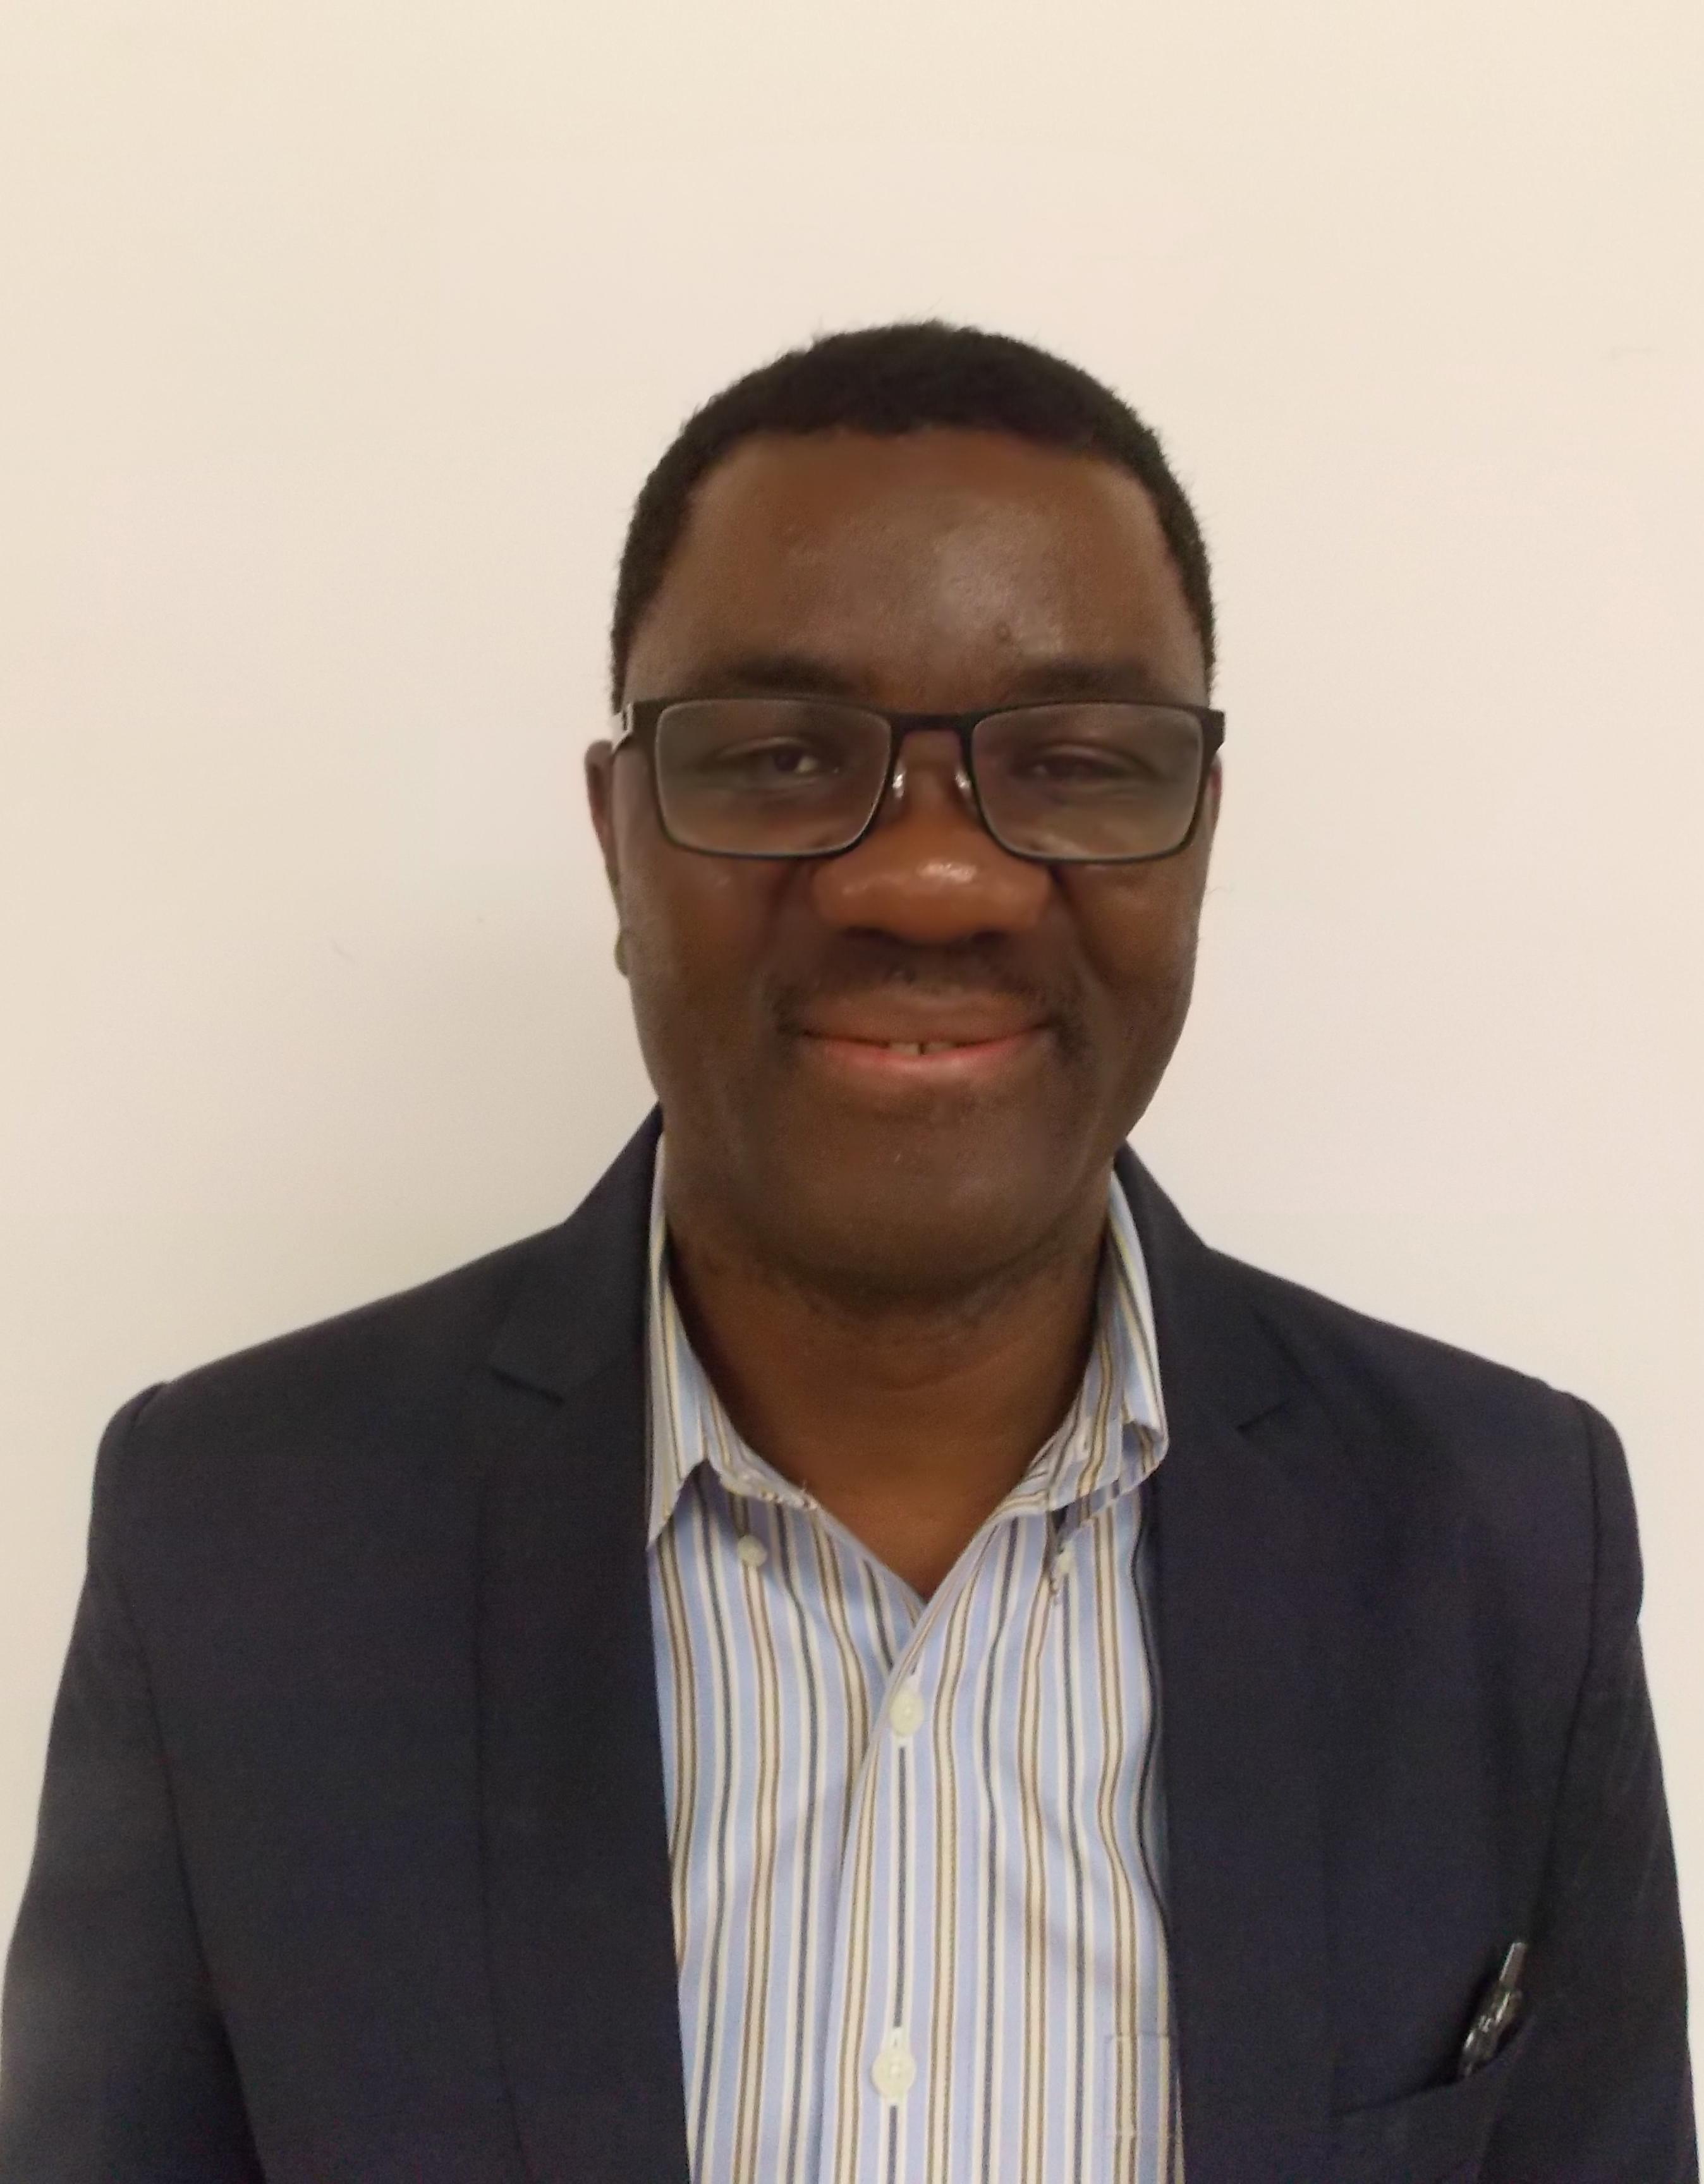 Emmanuel Benson